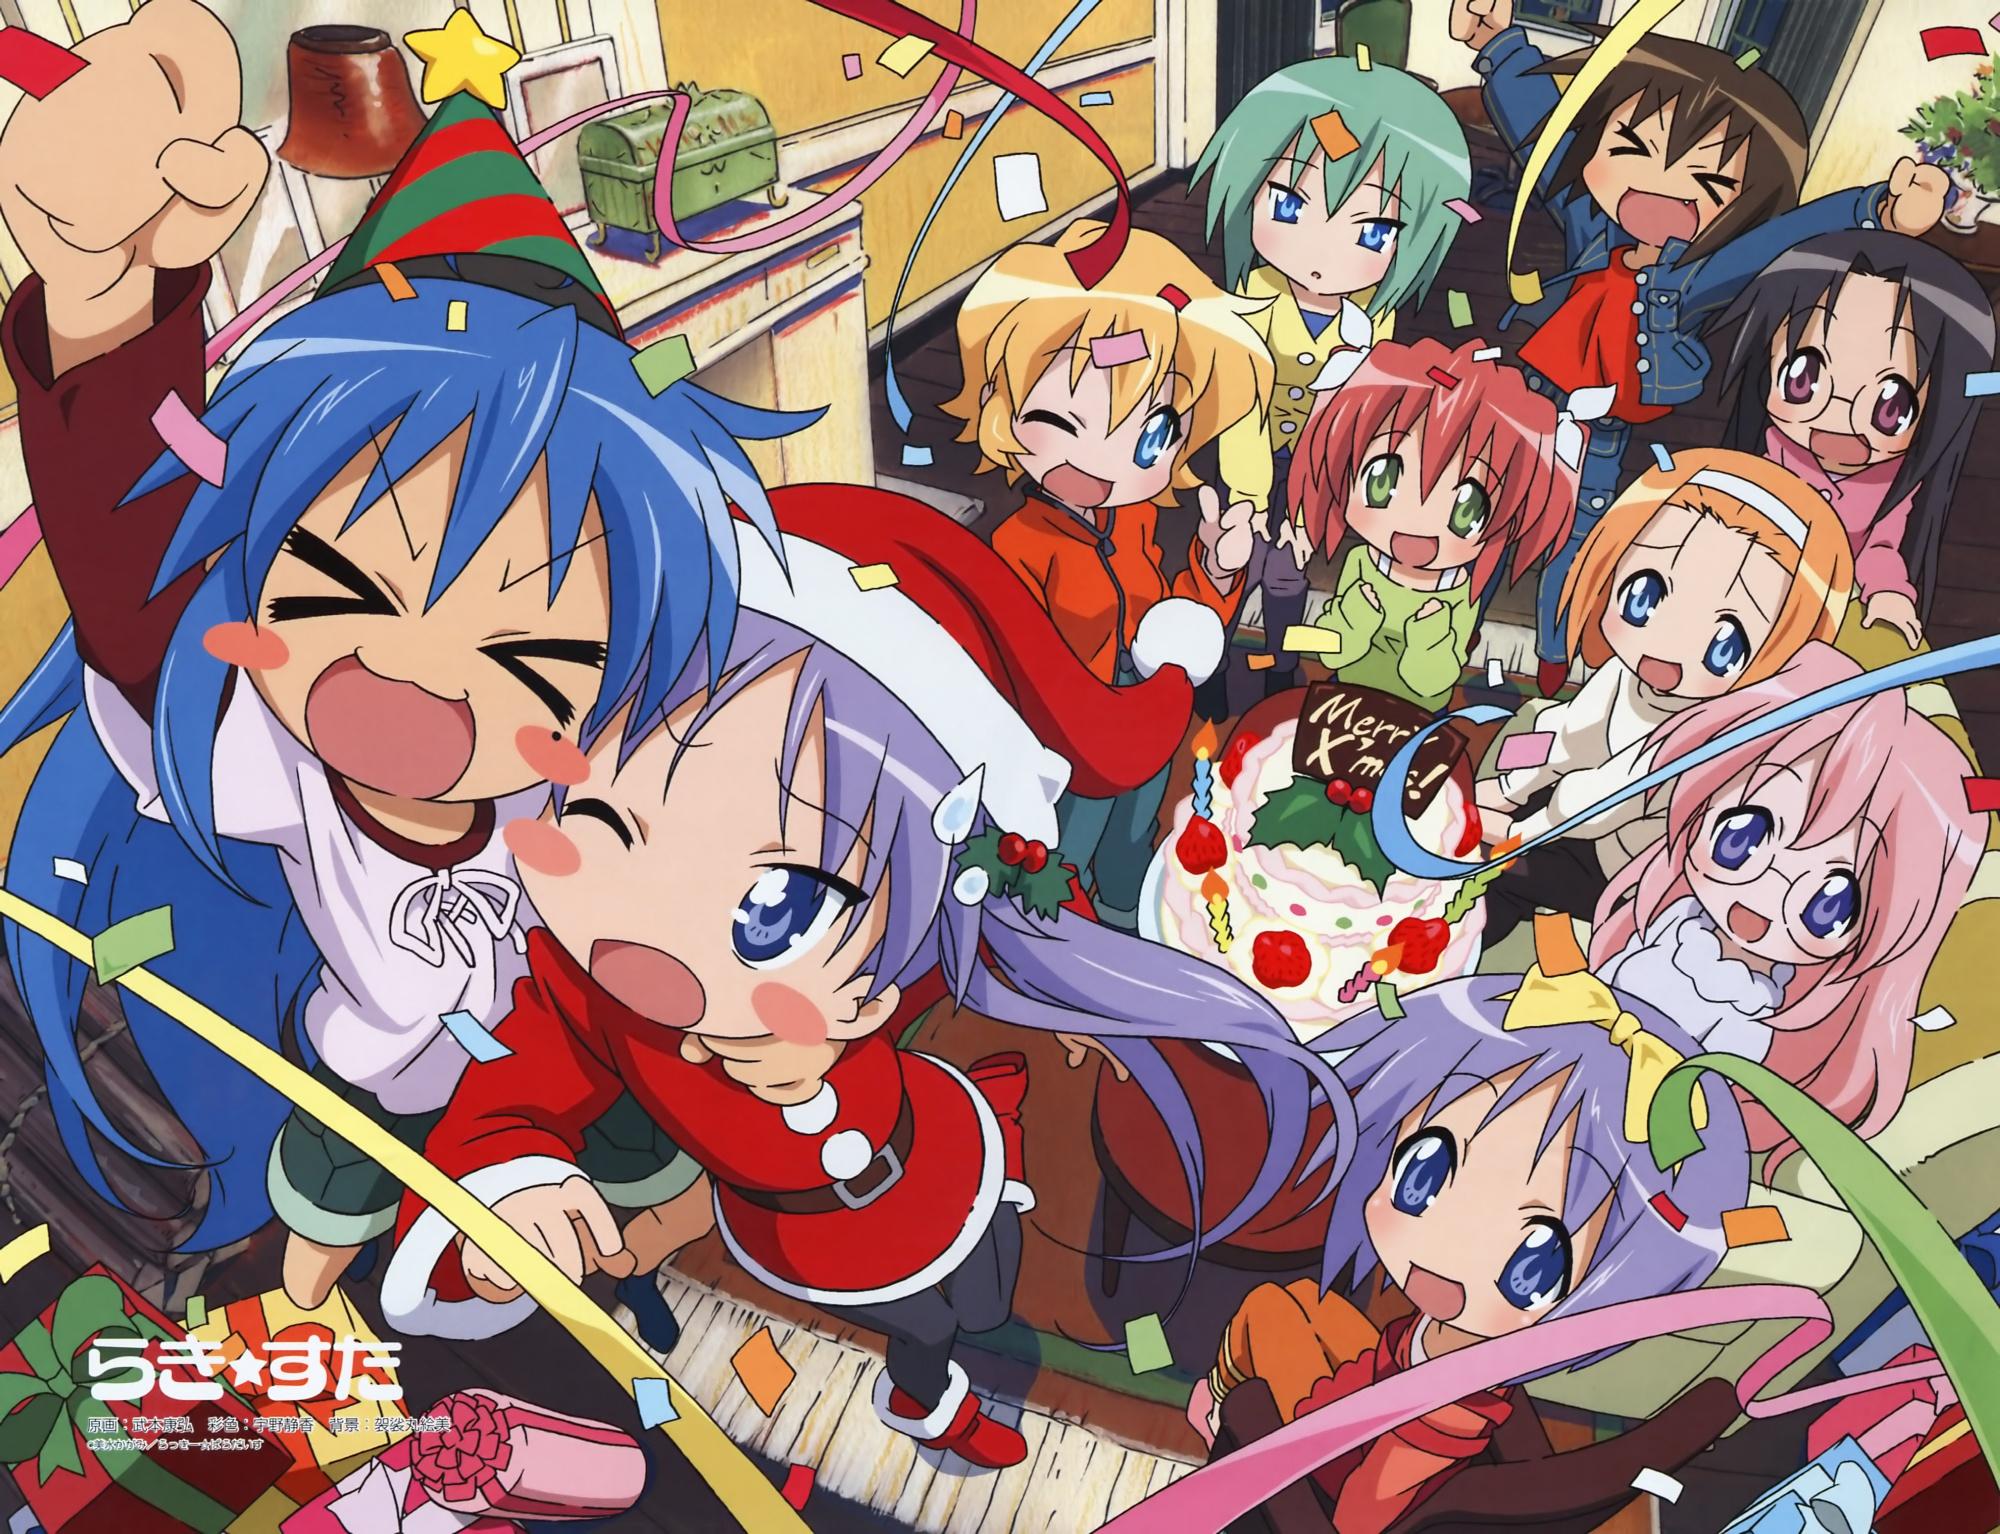 christmas group hiiragi_kagami hiiragi_tsukasa izumi_konata lucky_star takara_miyuki